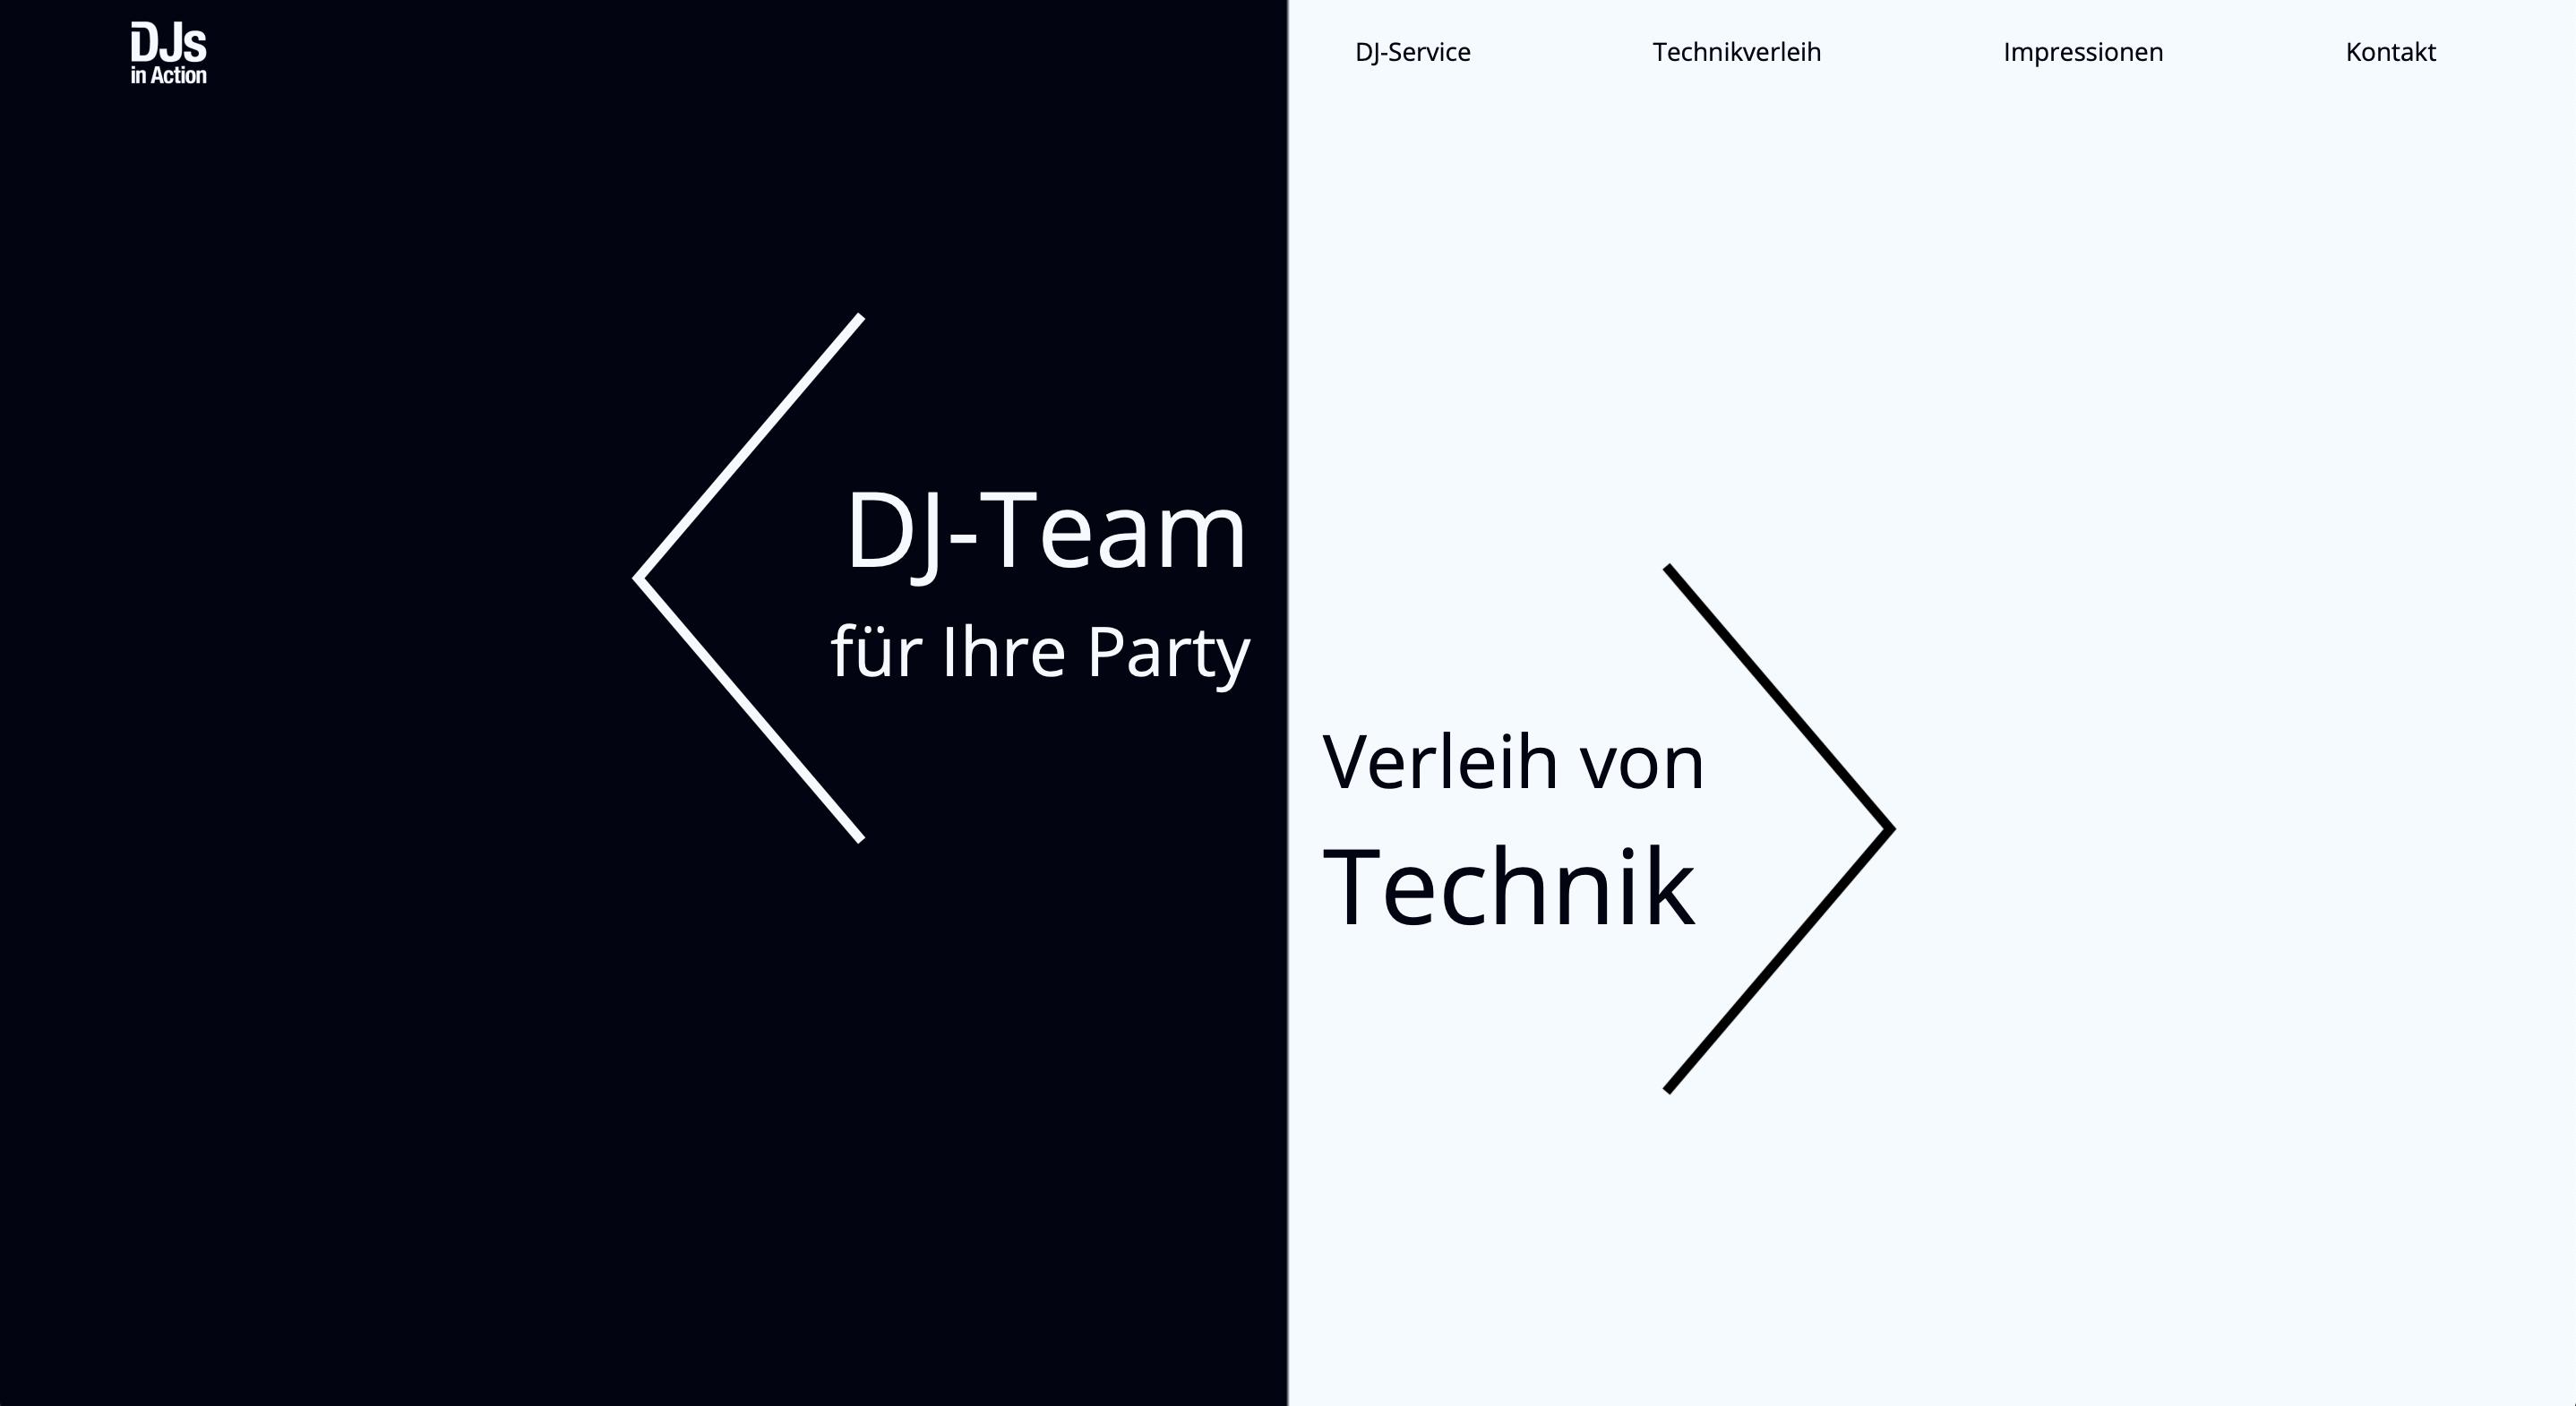 Webdesign Projekt für mobilen DJ Service sowie Technikverleih in Goslar – DJs in Action